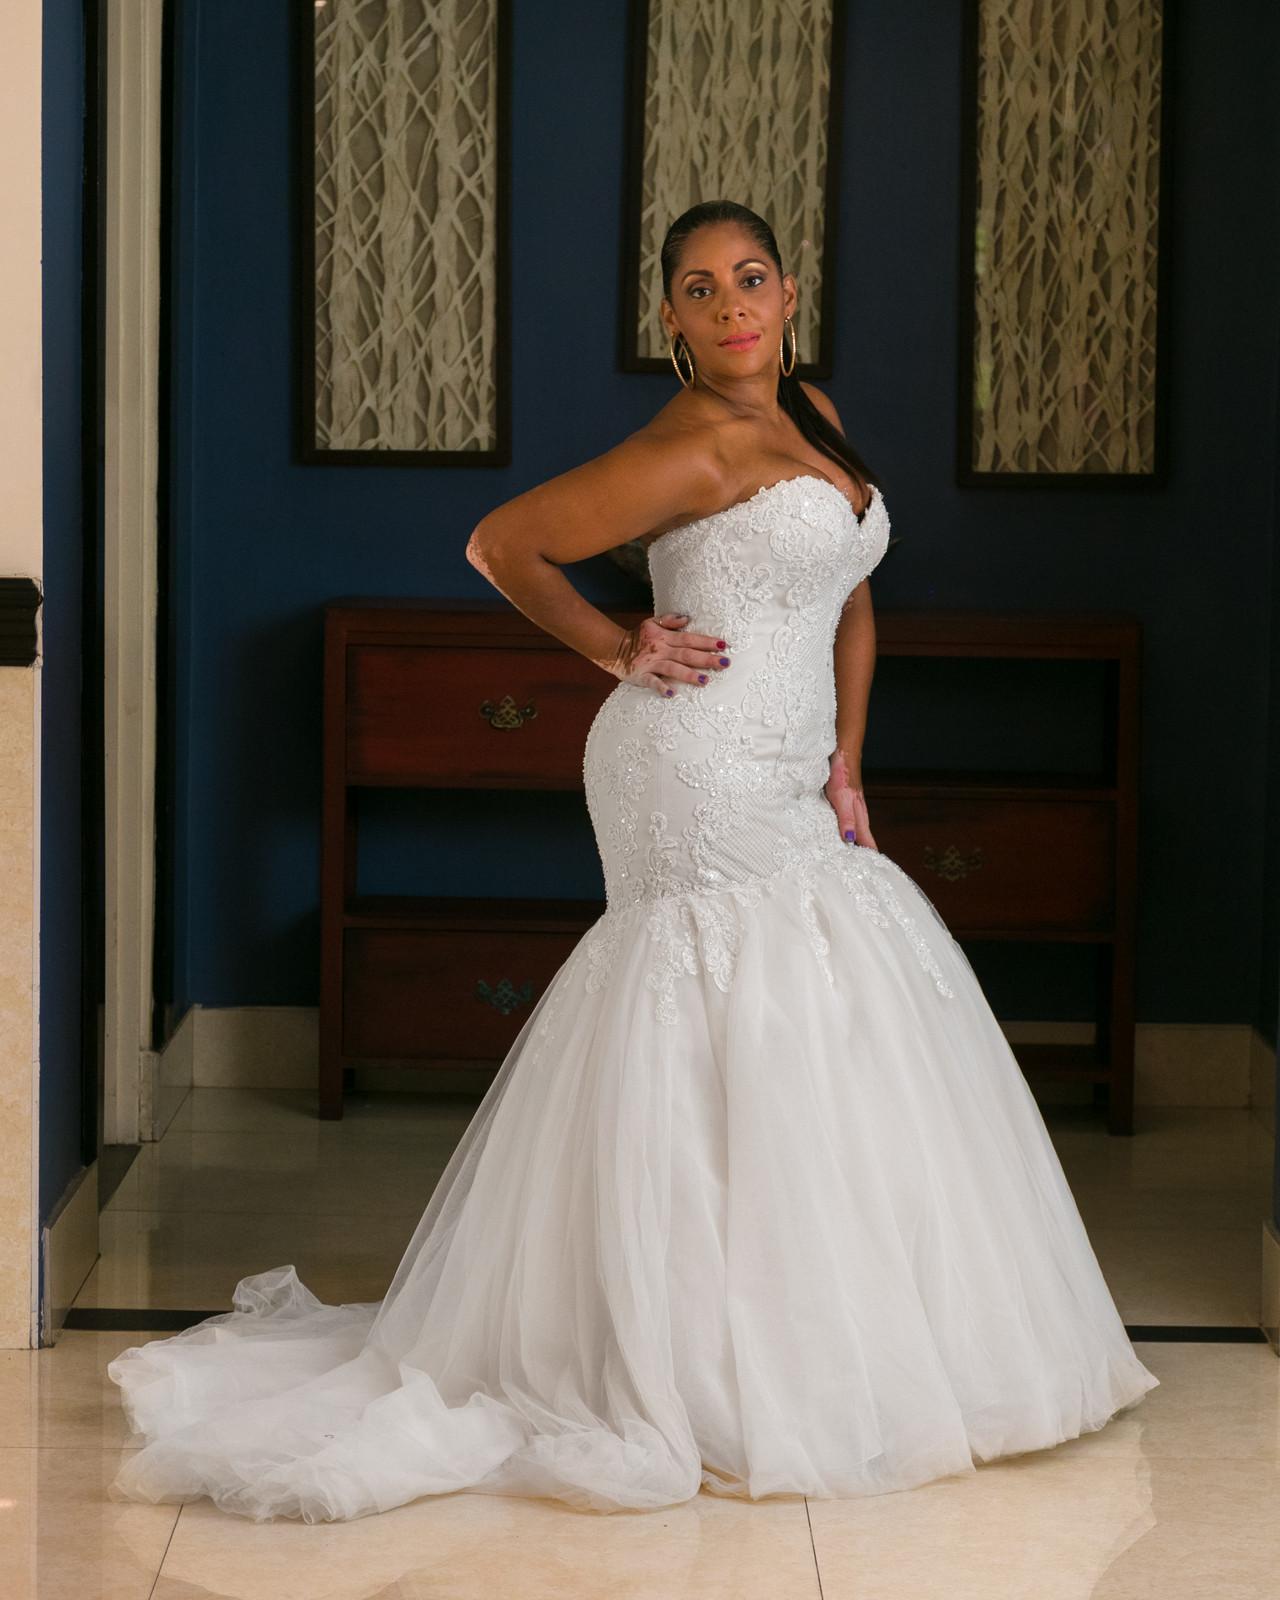 Bridal Shops in Jamaica | Kingston | Bliss Bridal Boutique